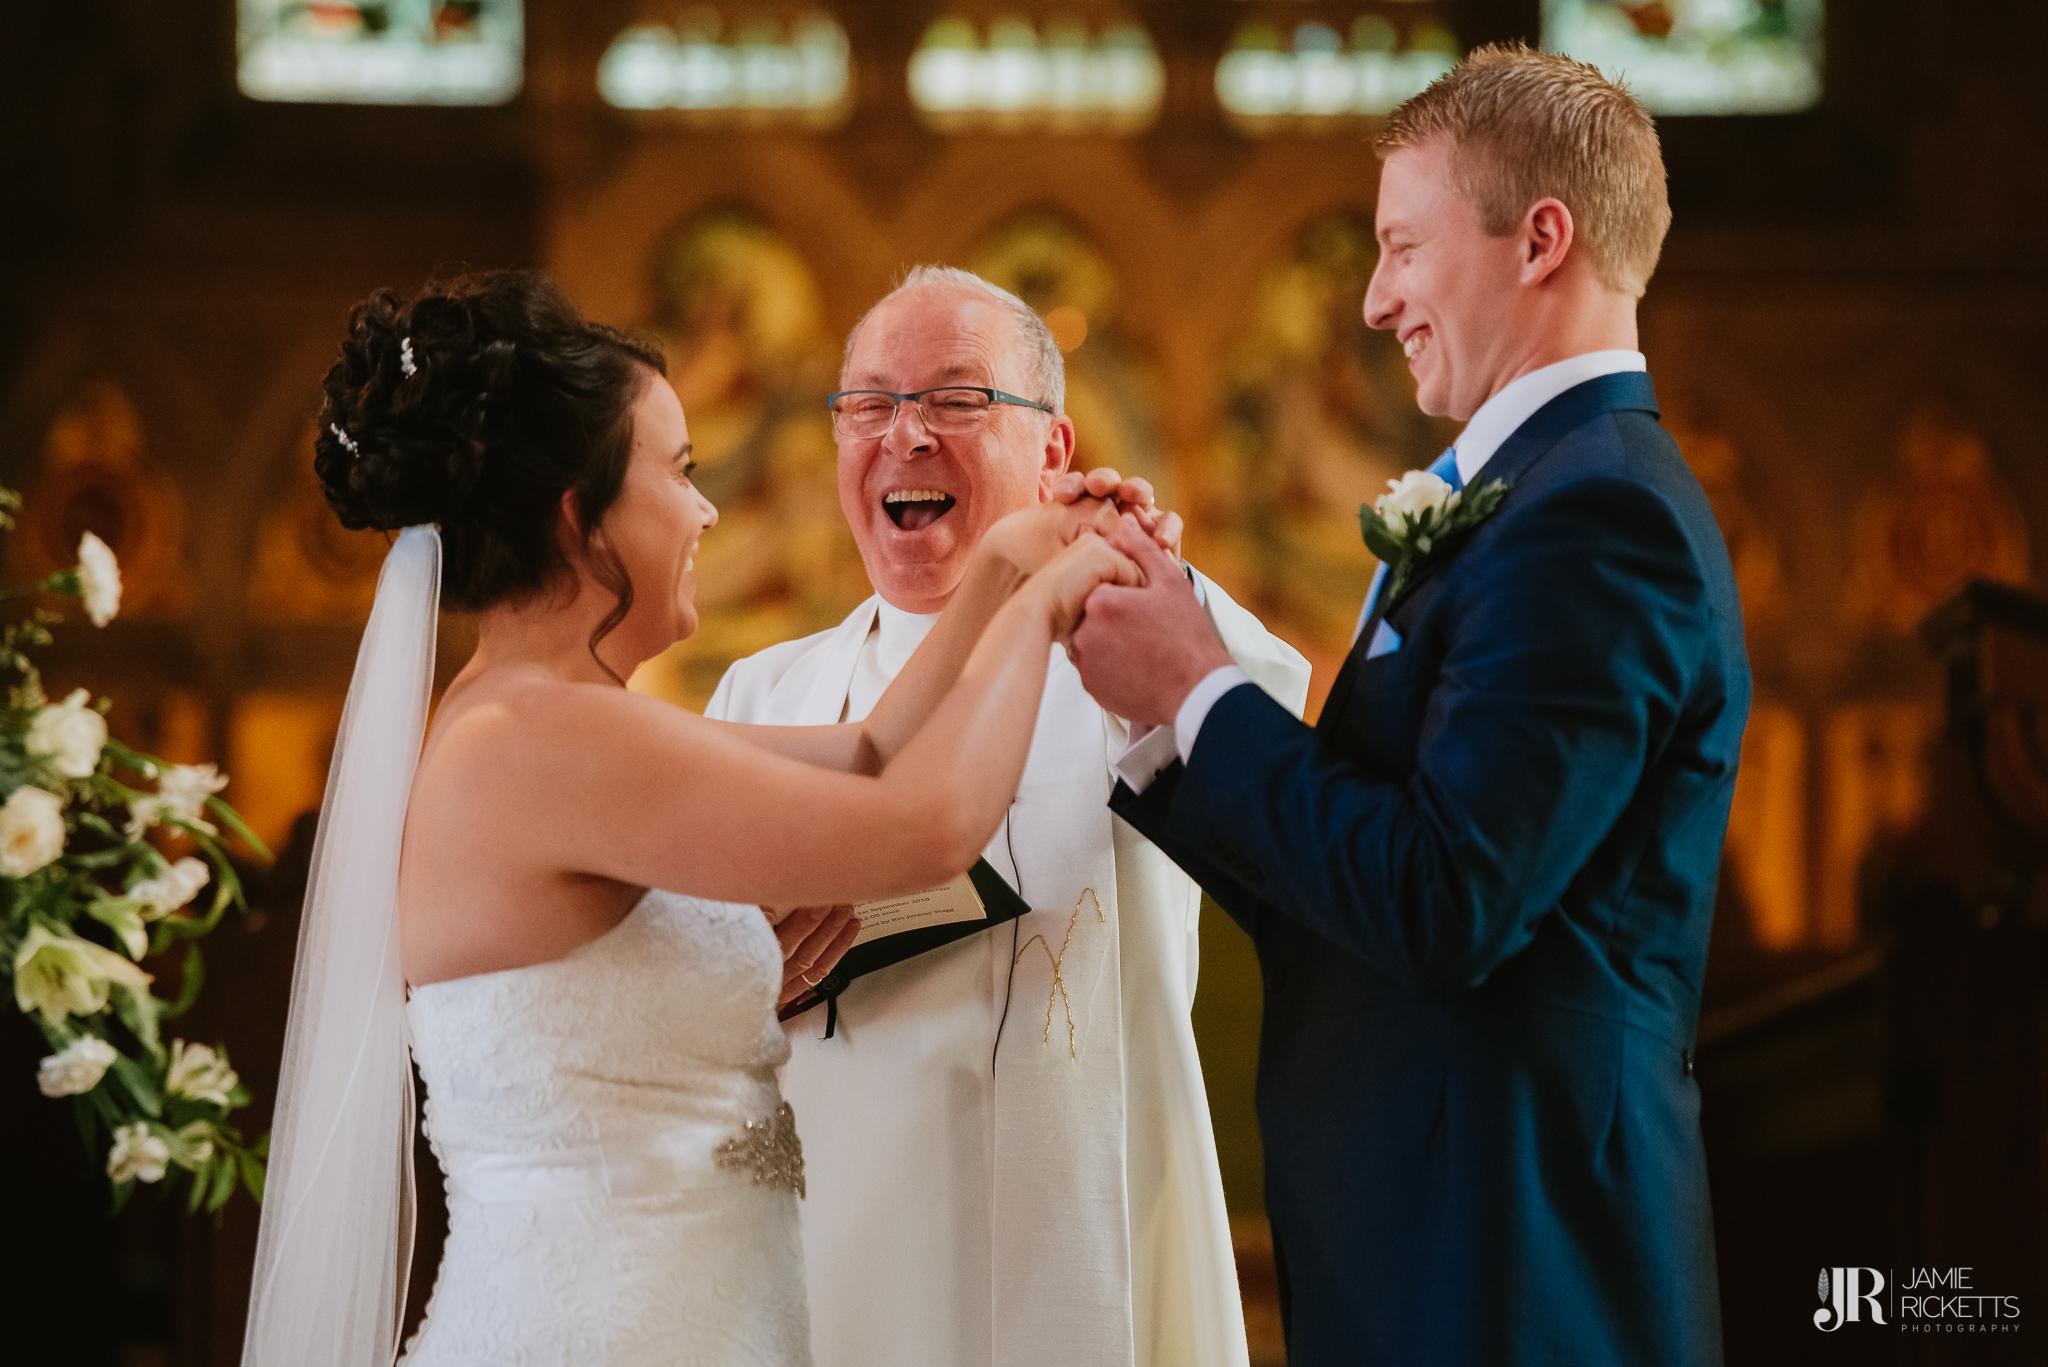 Wedding-Photographer-Shropshire-13.JPG